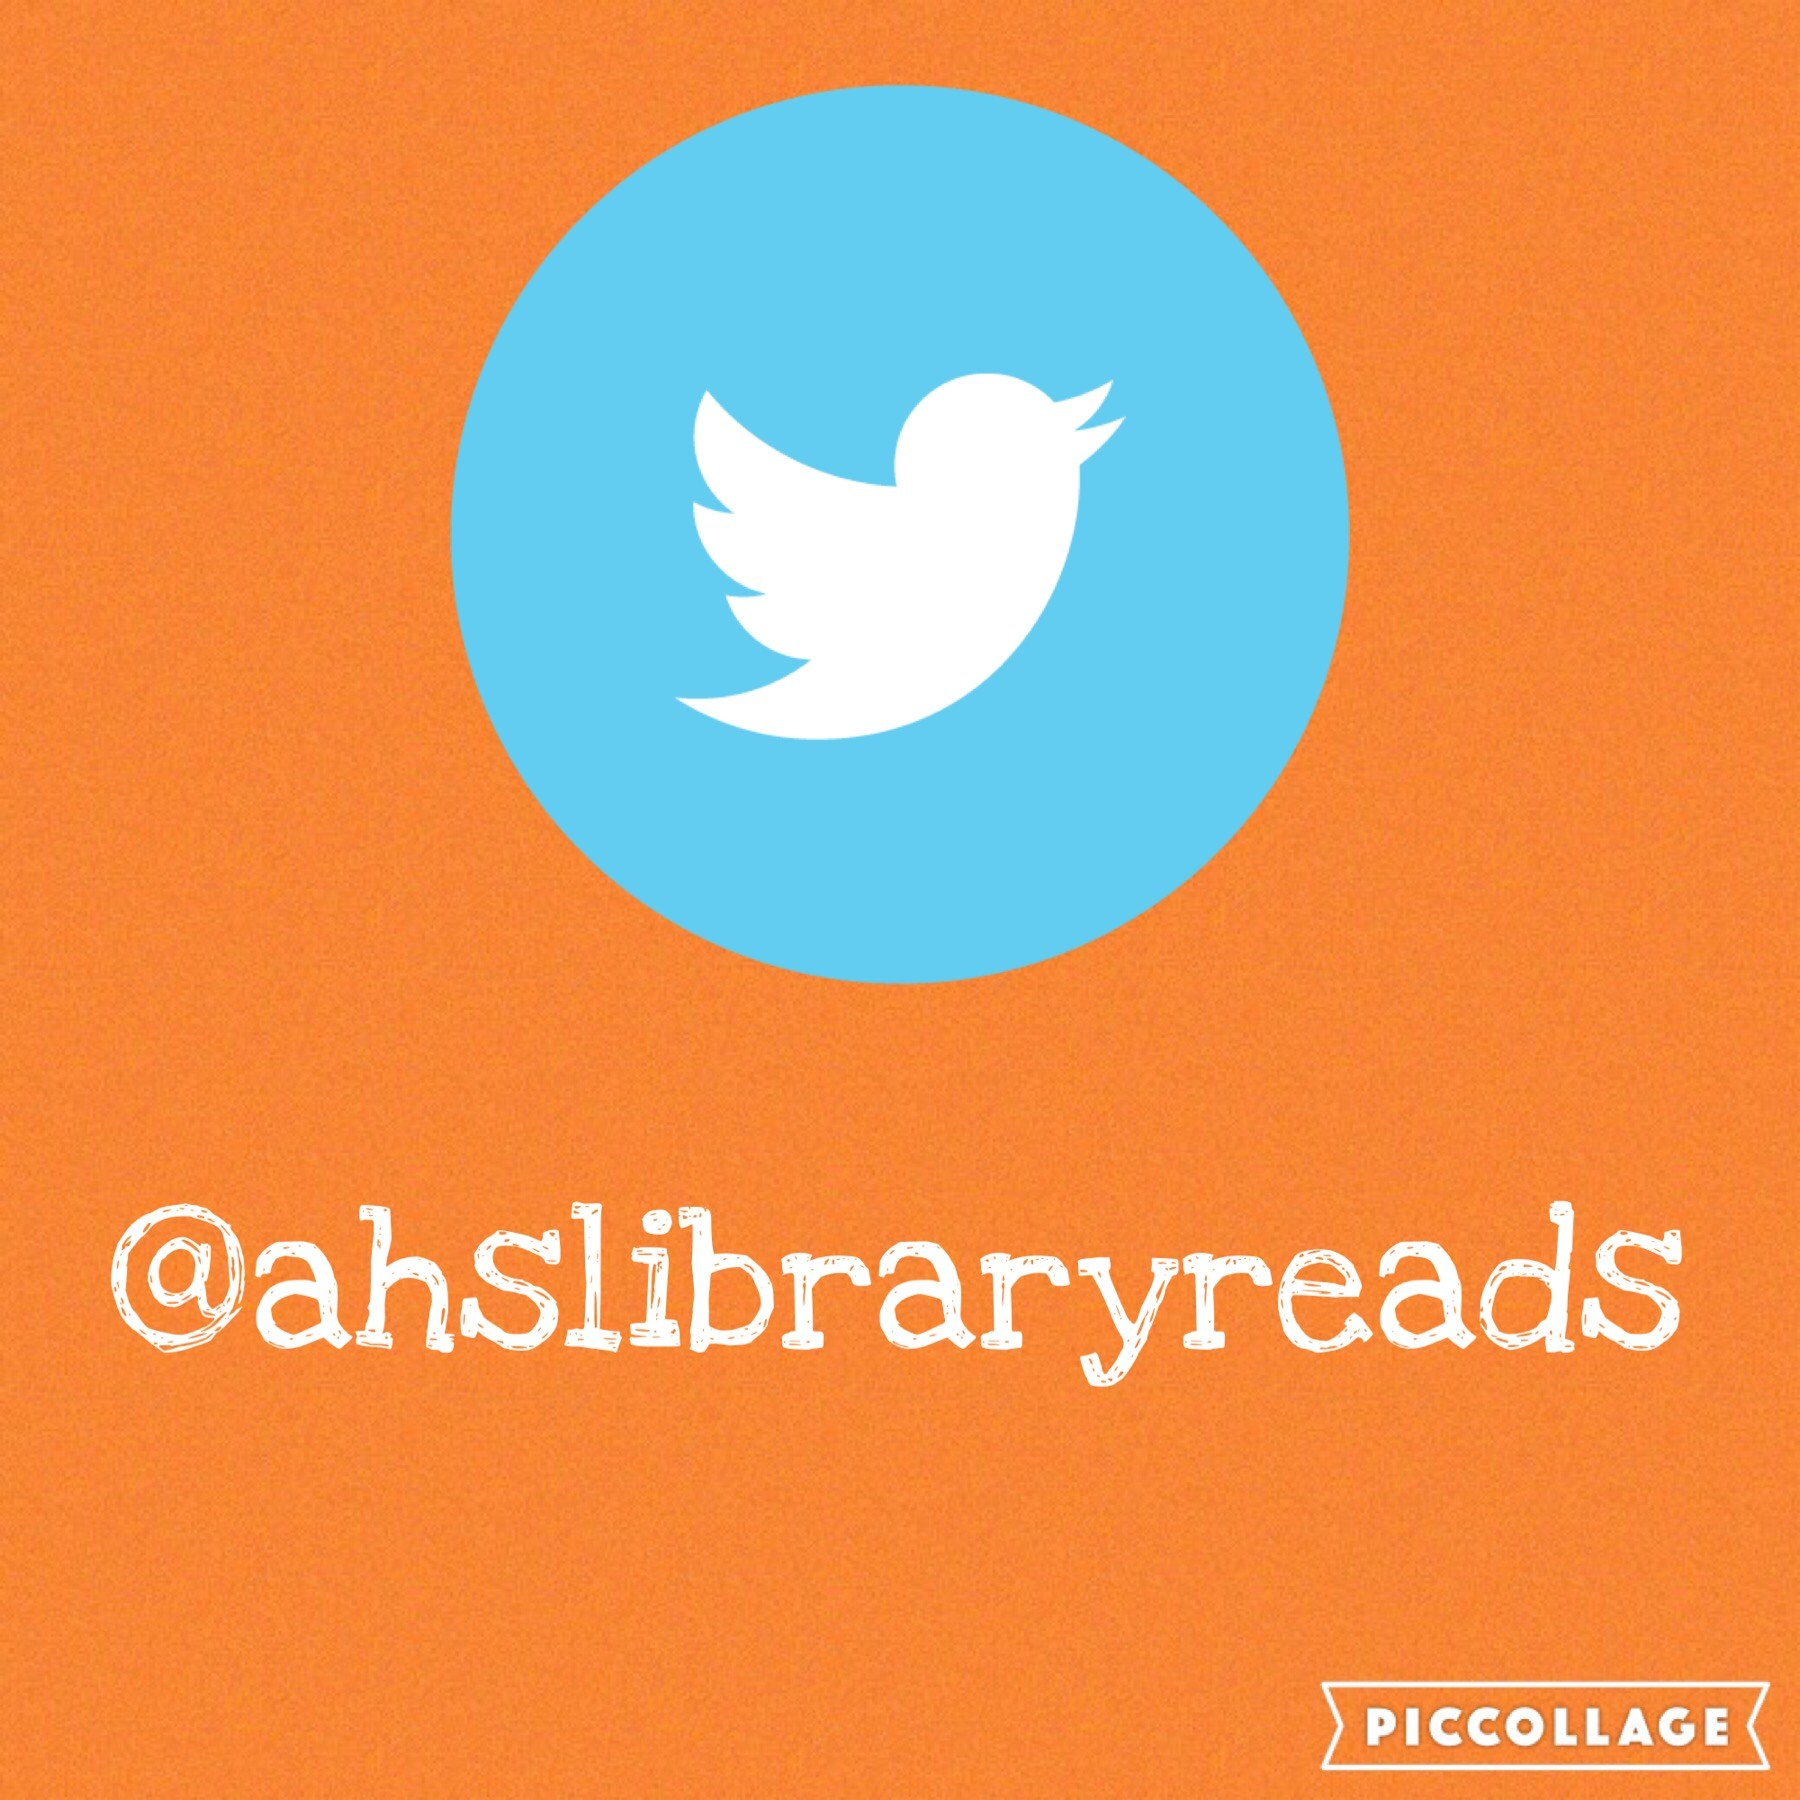 Twitter @ahslibraryreads